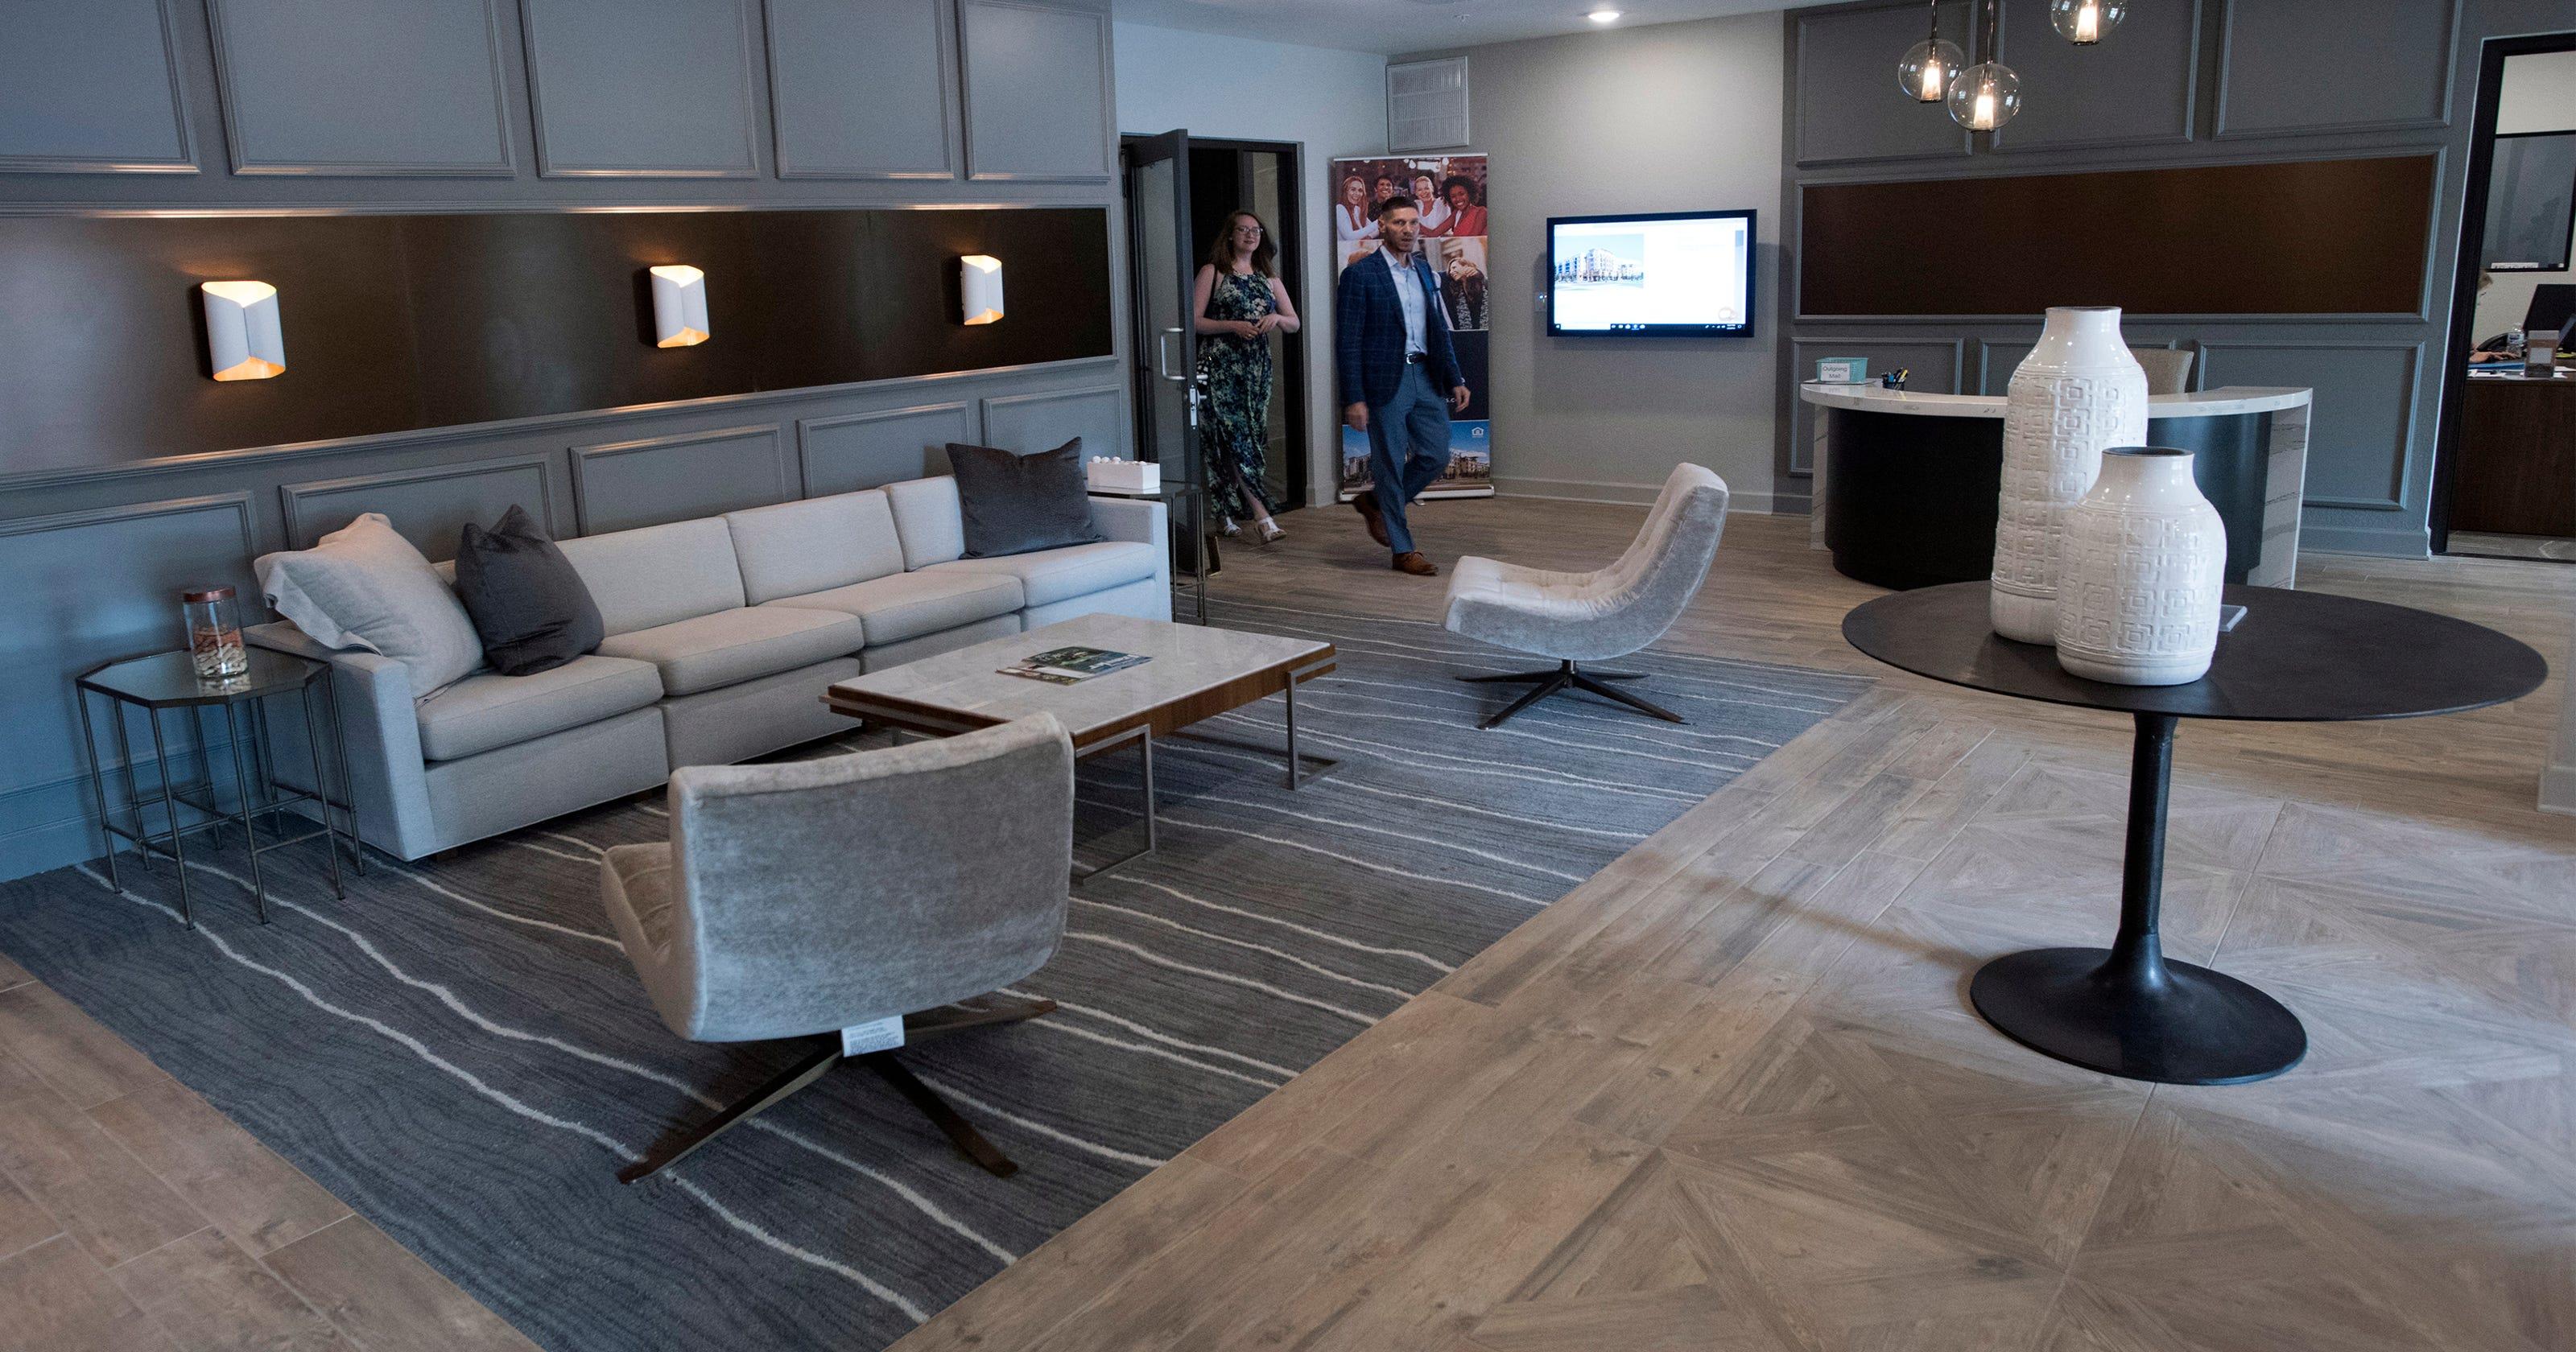 Southtowne Apartments Hope To Lure Millennials To Downtown Pensacola